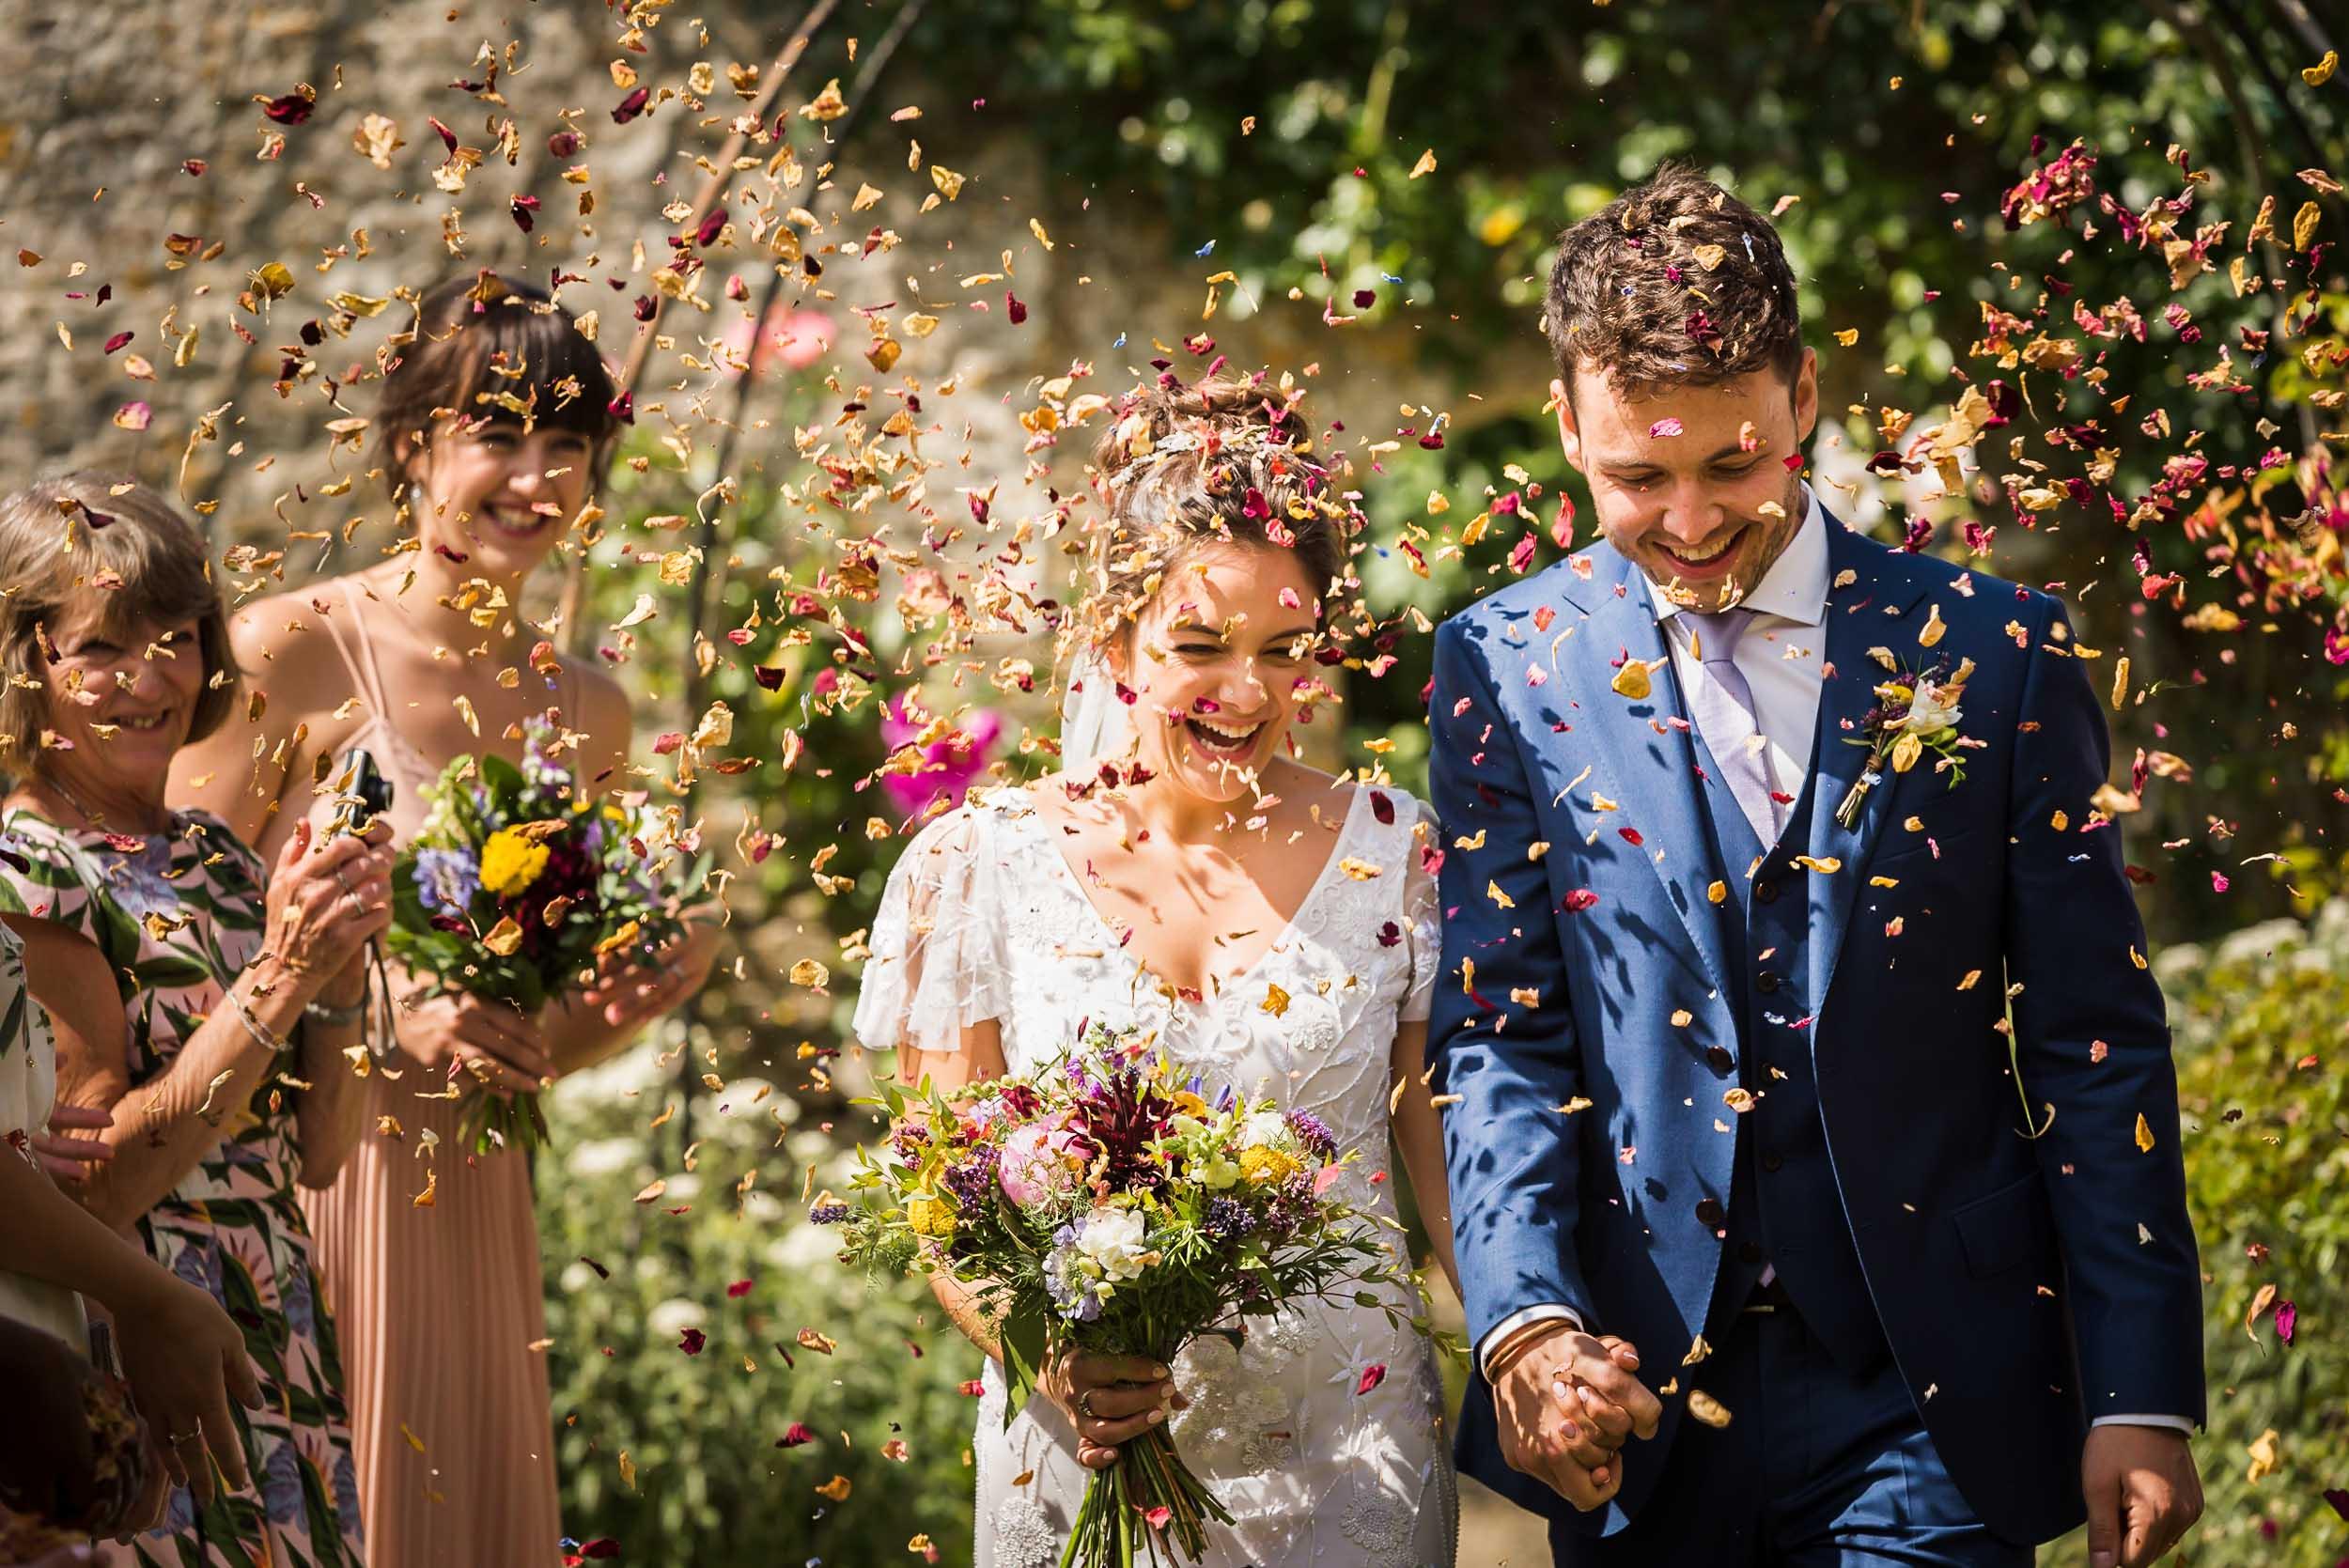 NC-20170805-2017-07-05_lara-and-nick-wedding-0680.jpg